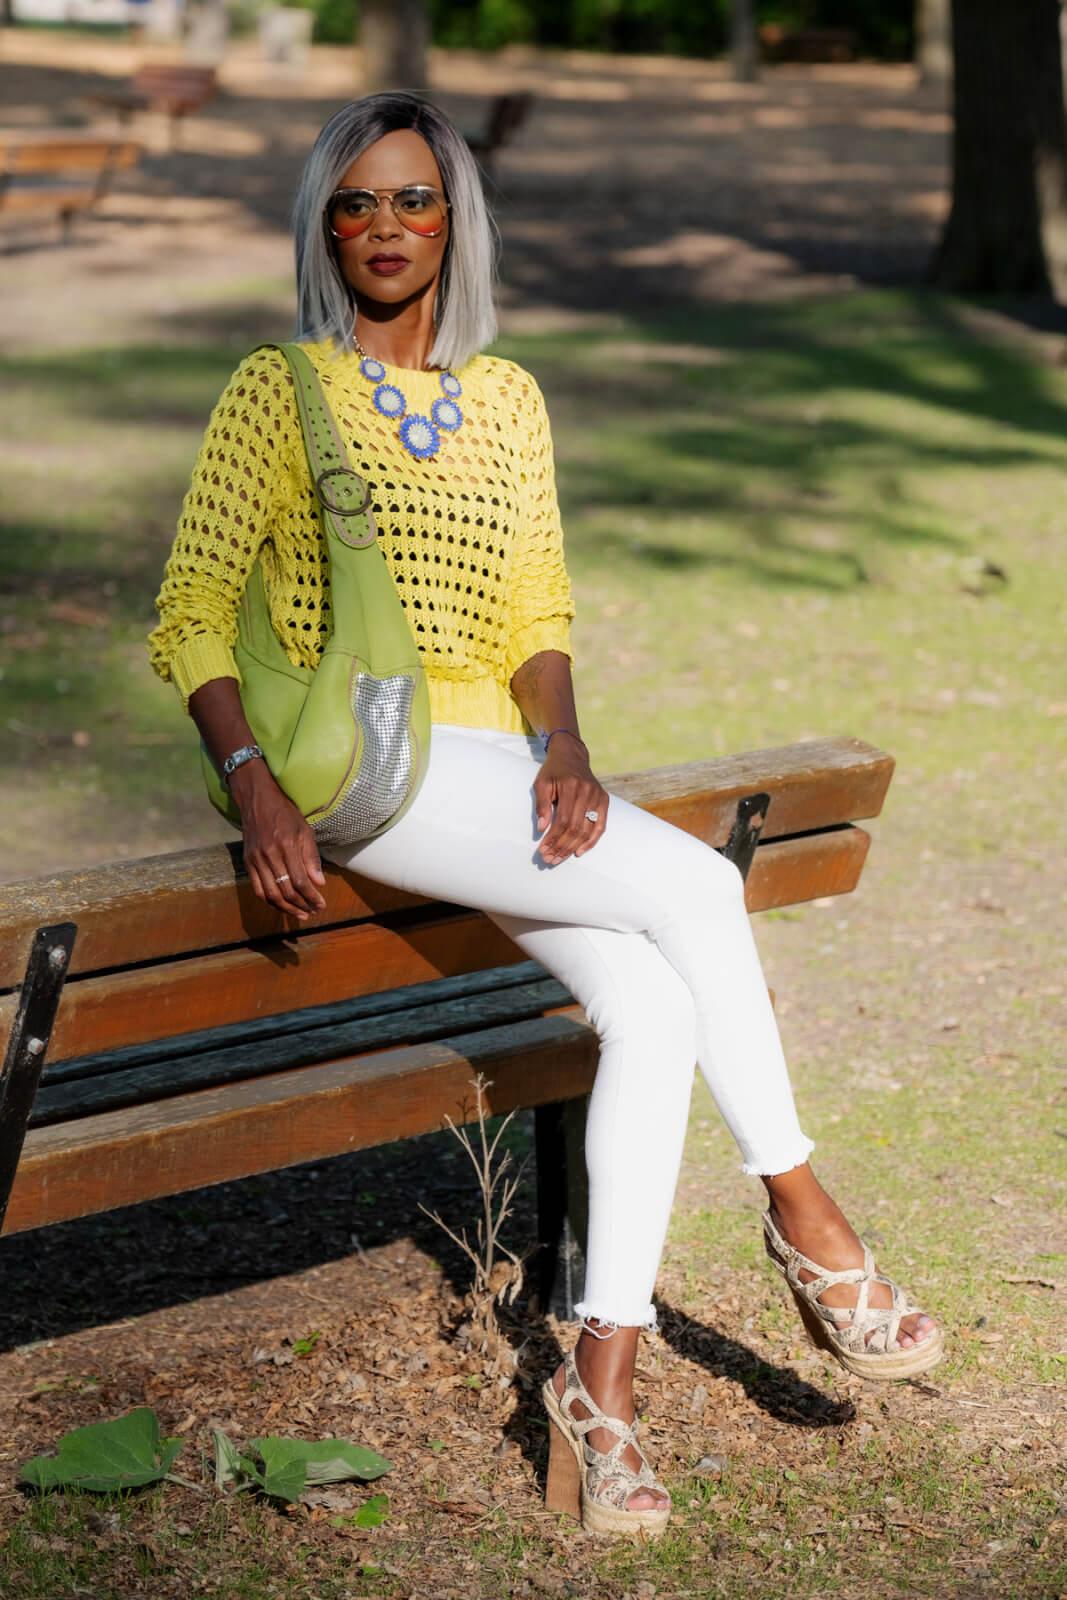 Winnipeg Fashion Blogger, Winnipeg Fashion, Style My Dreams, Summer Outfit Ideas, Outfit Sharing, Knit Sweaters